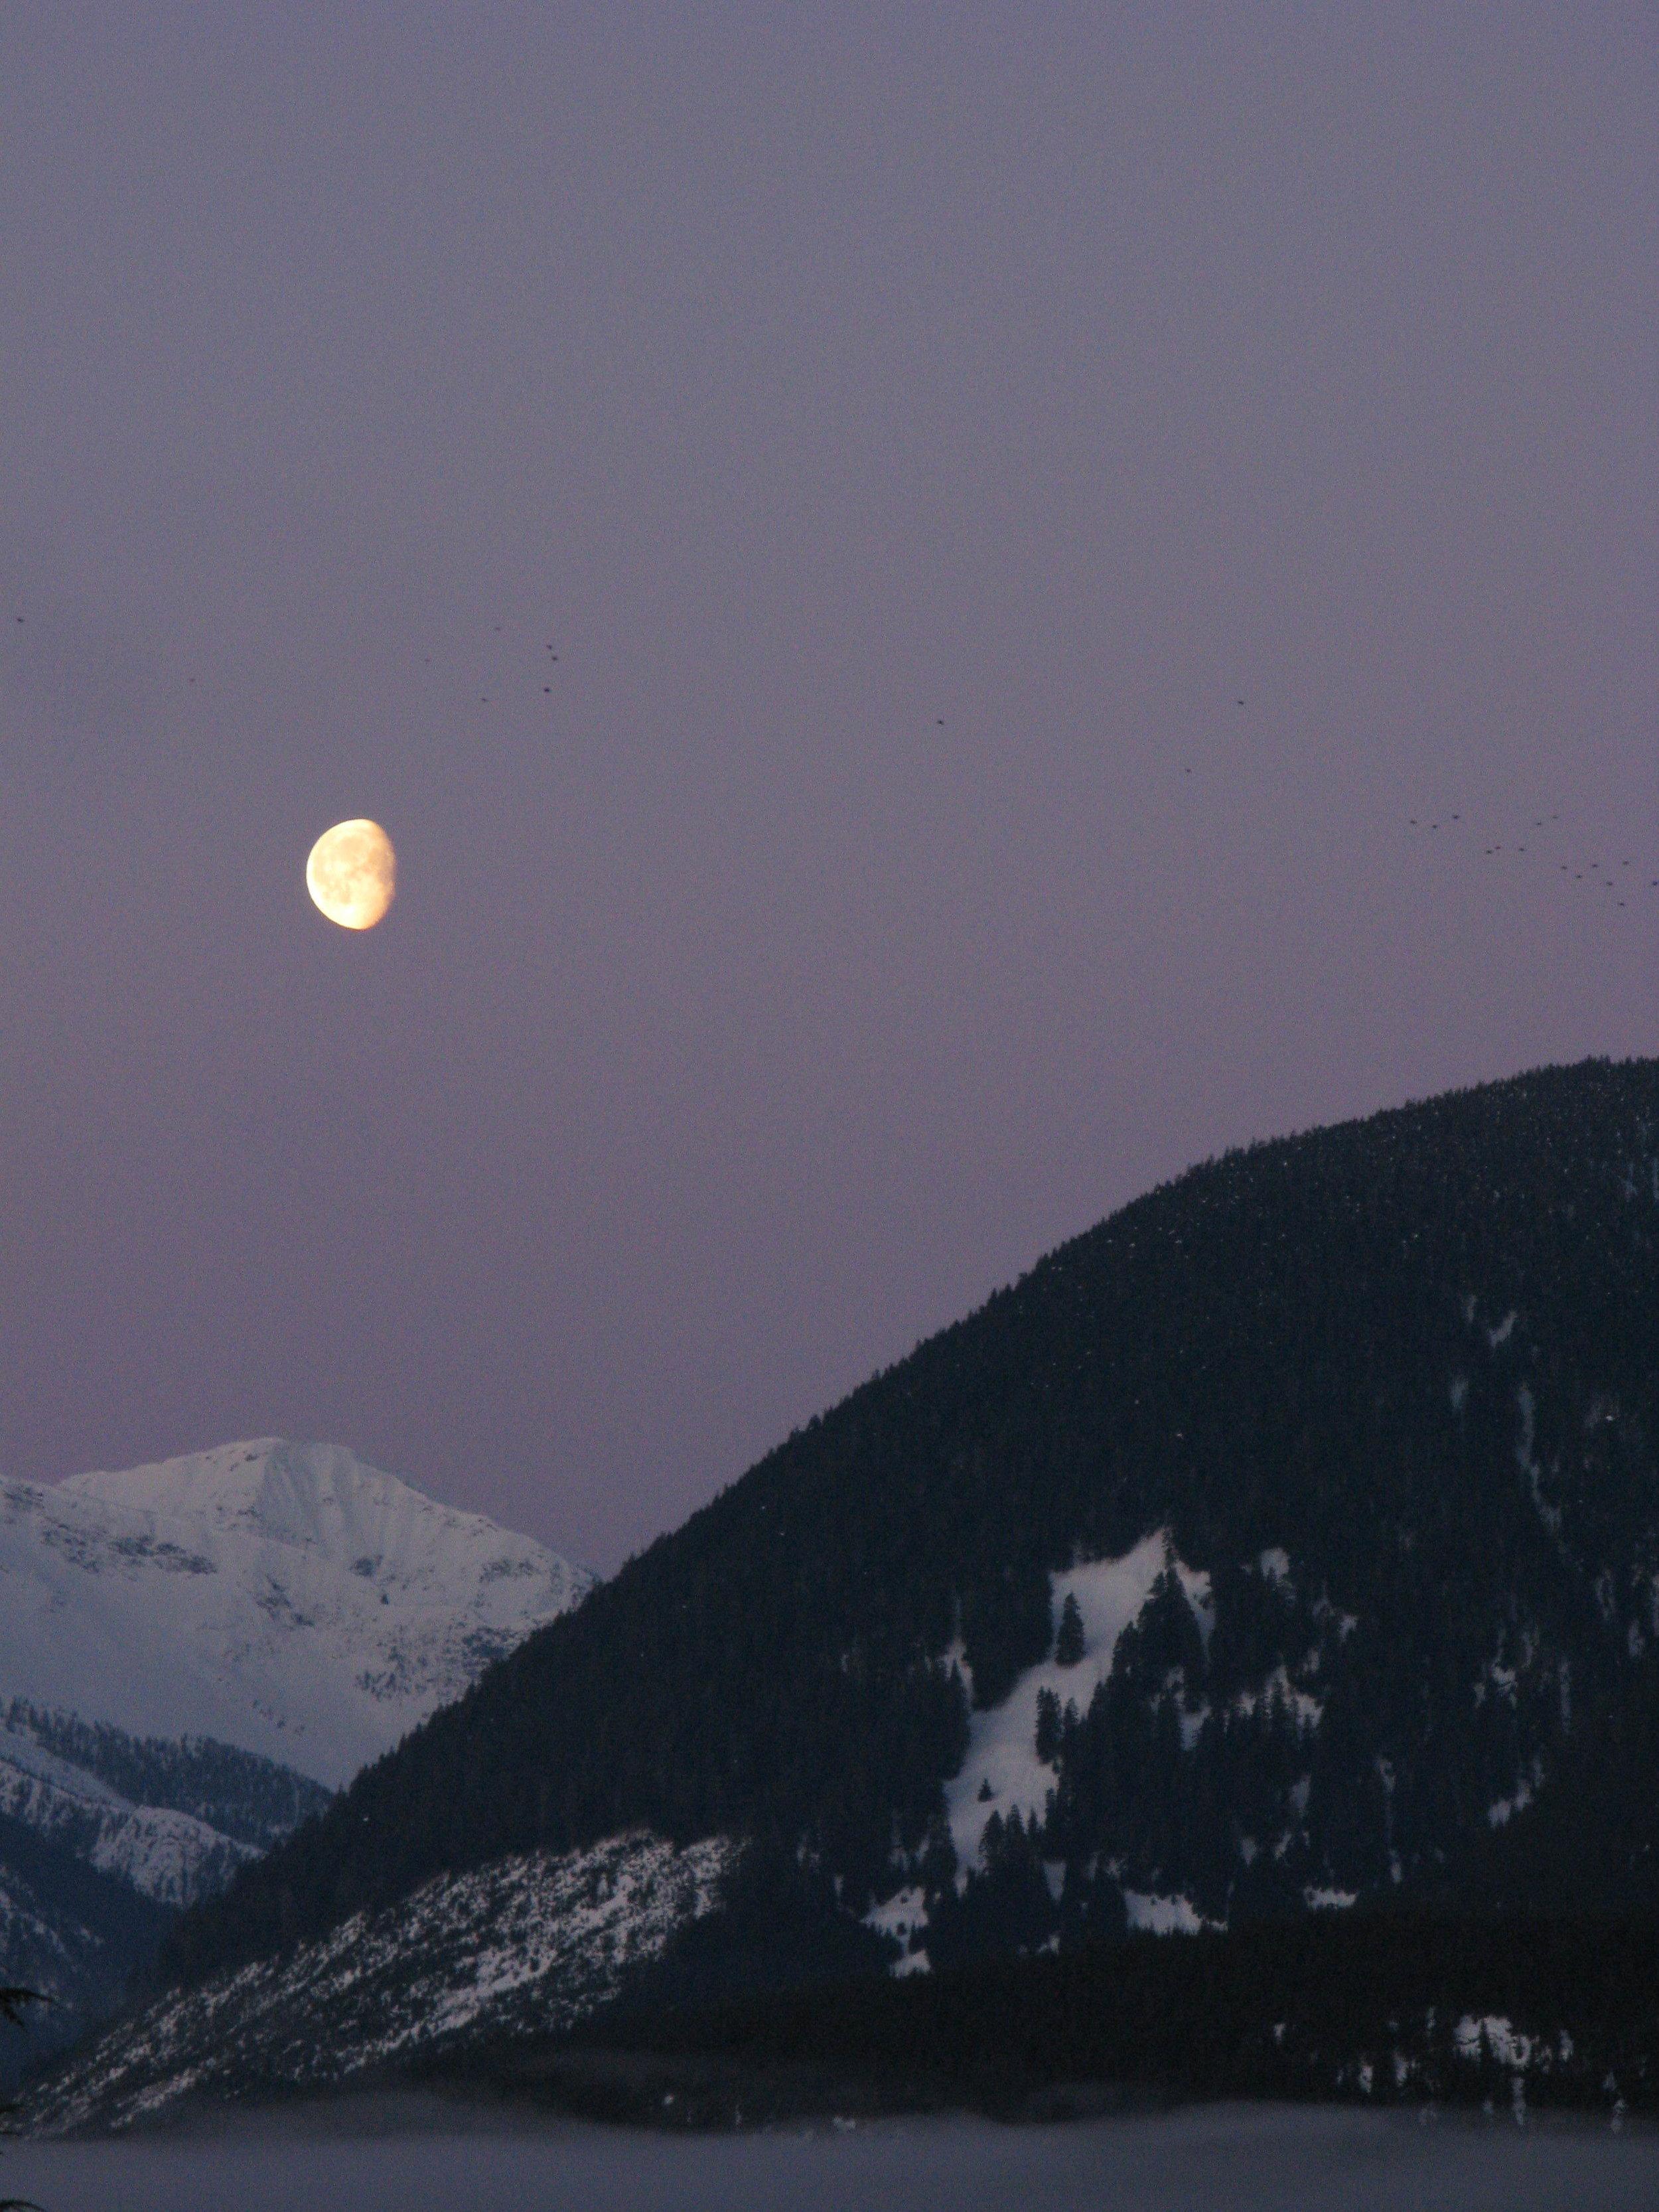 Early Moon /photo: Dano Pendygrasse